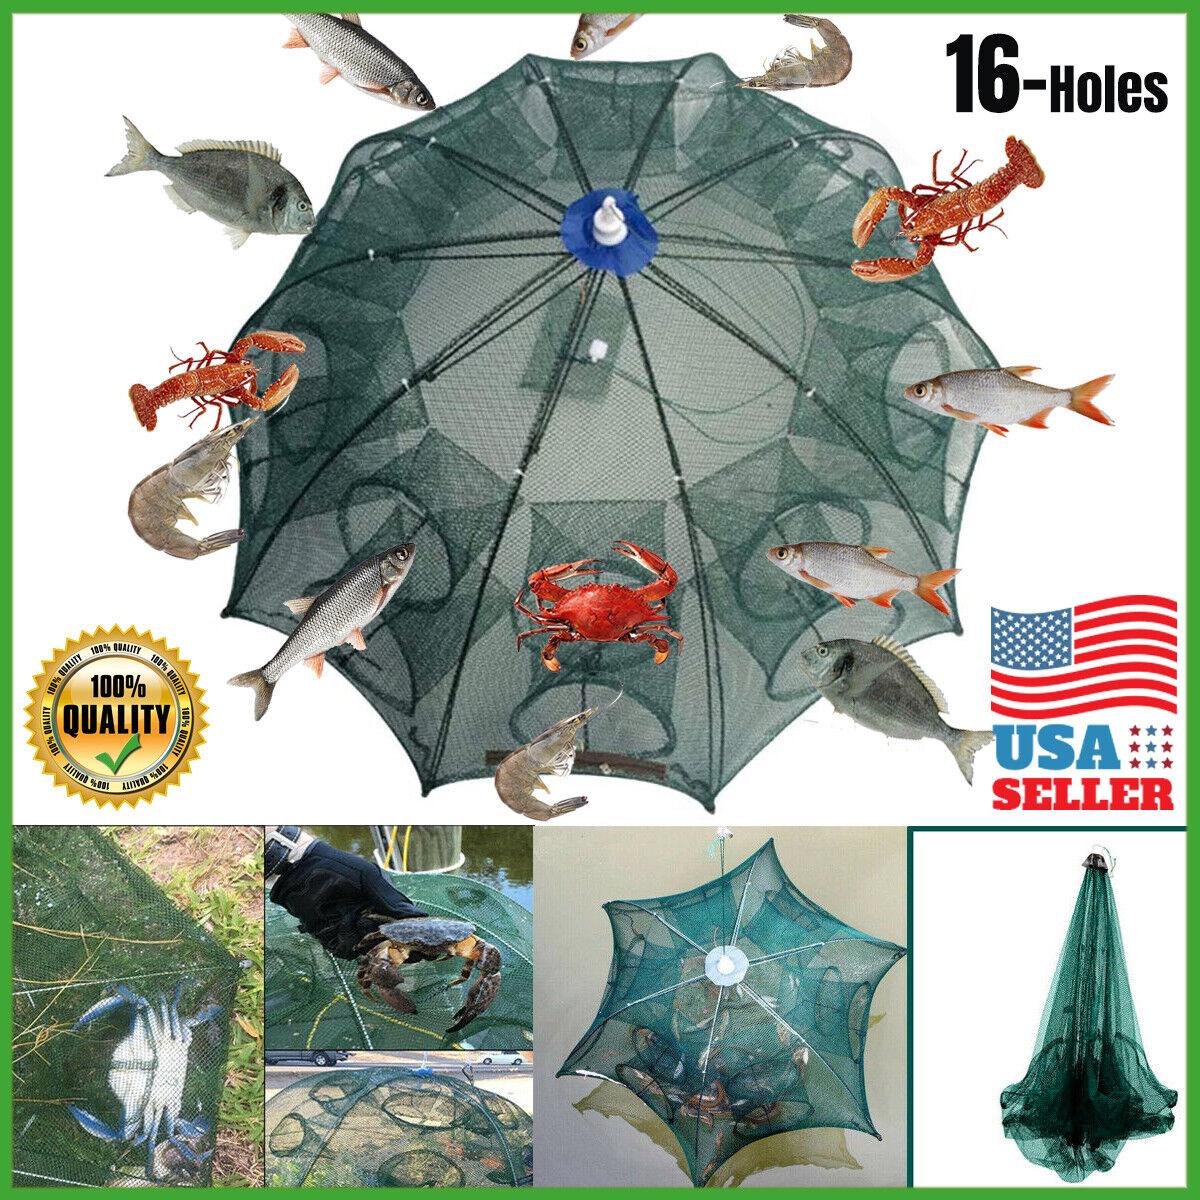 USA Fishing Bait Trap Crab Net Crawdad Shrimp Cast Dip Cage Fish Minow Foldable Fishing